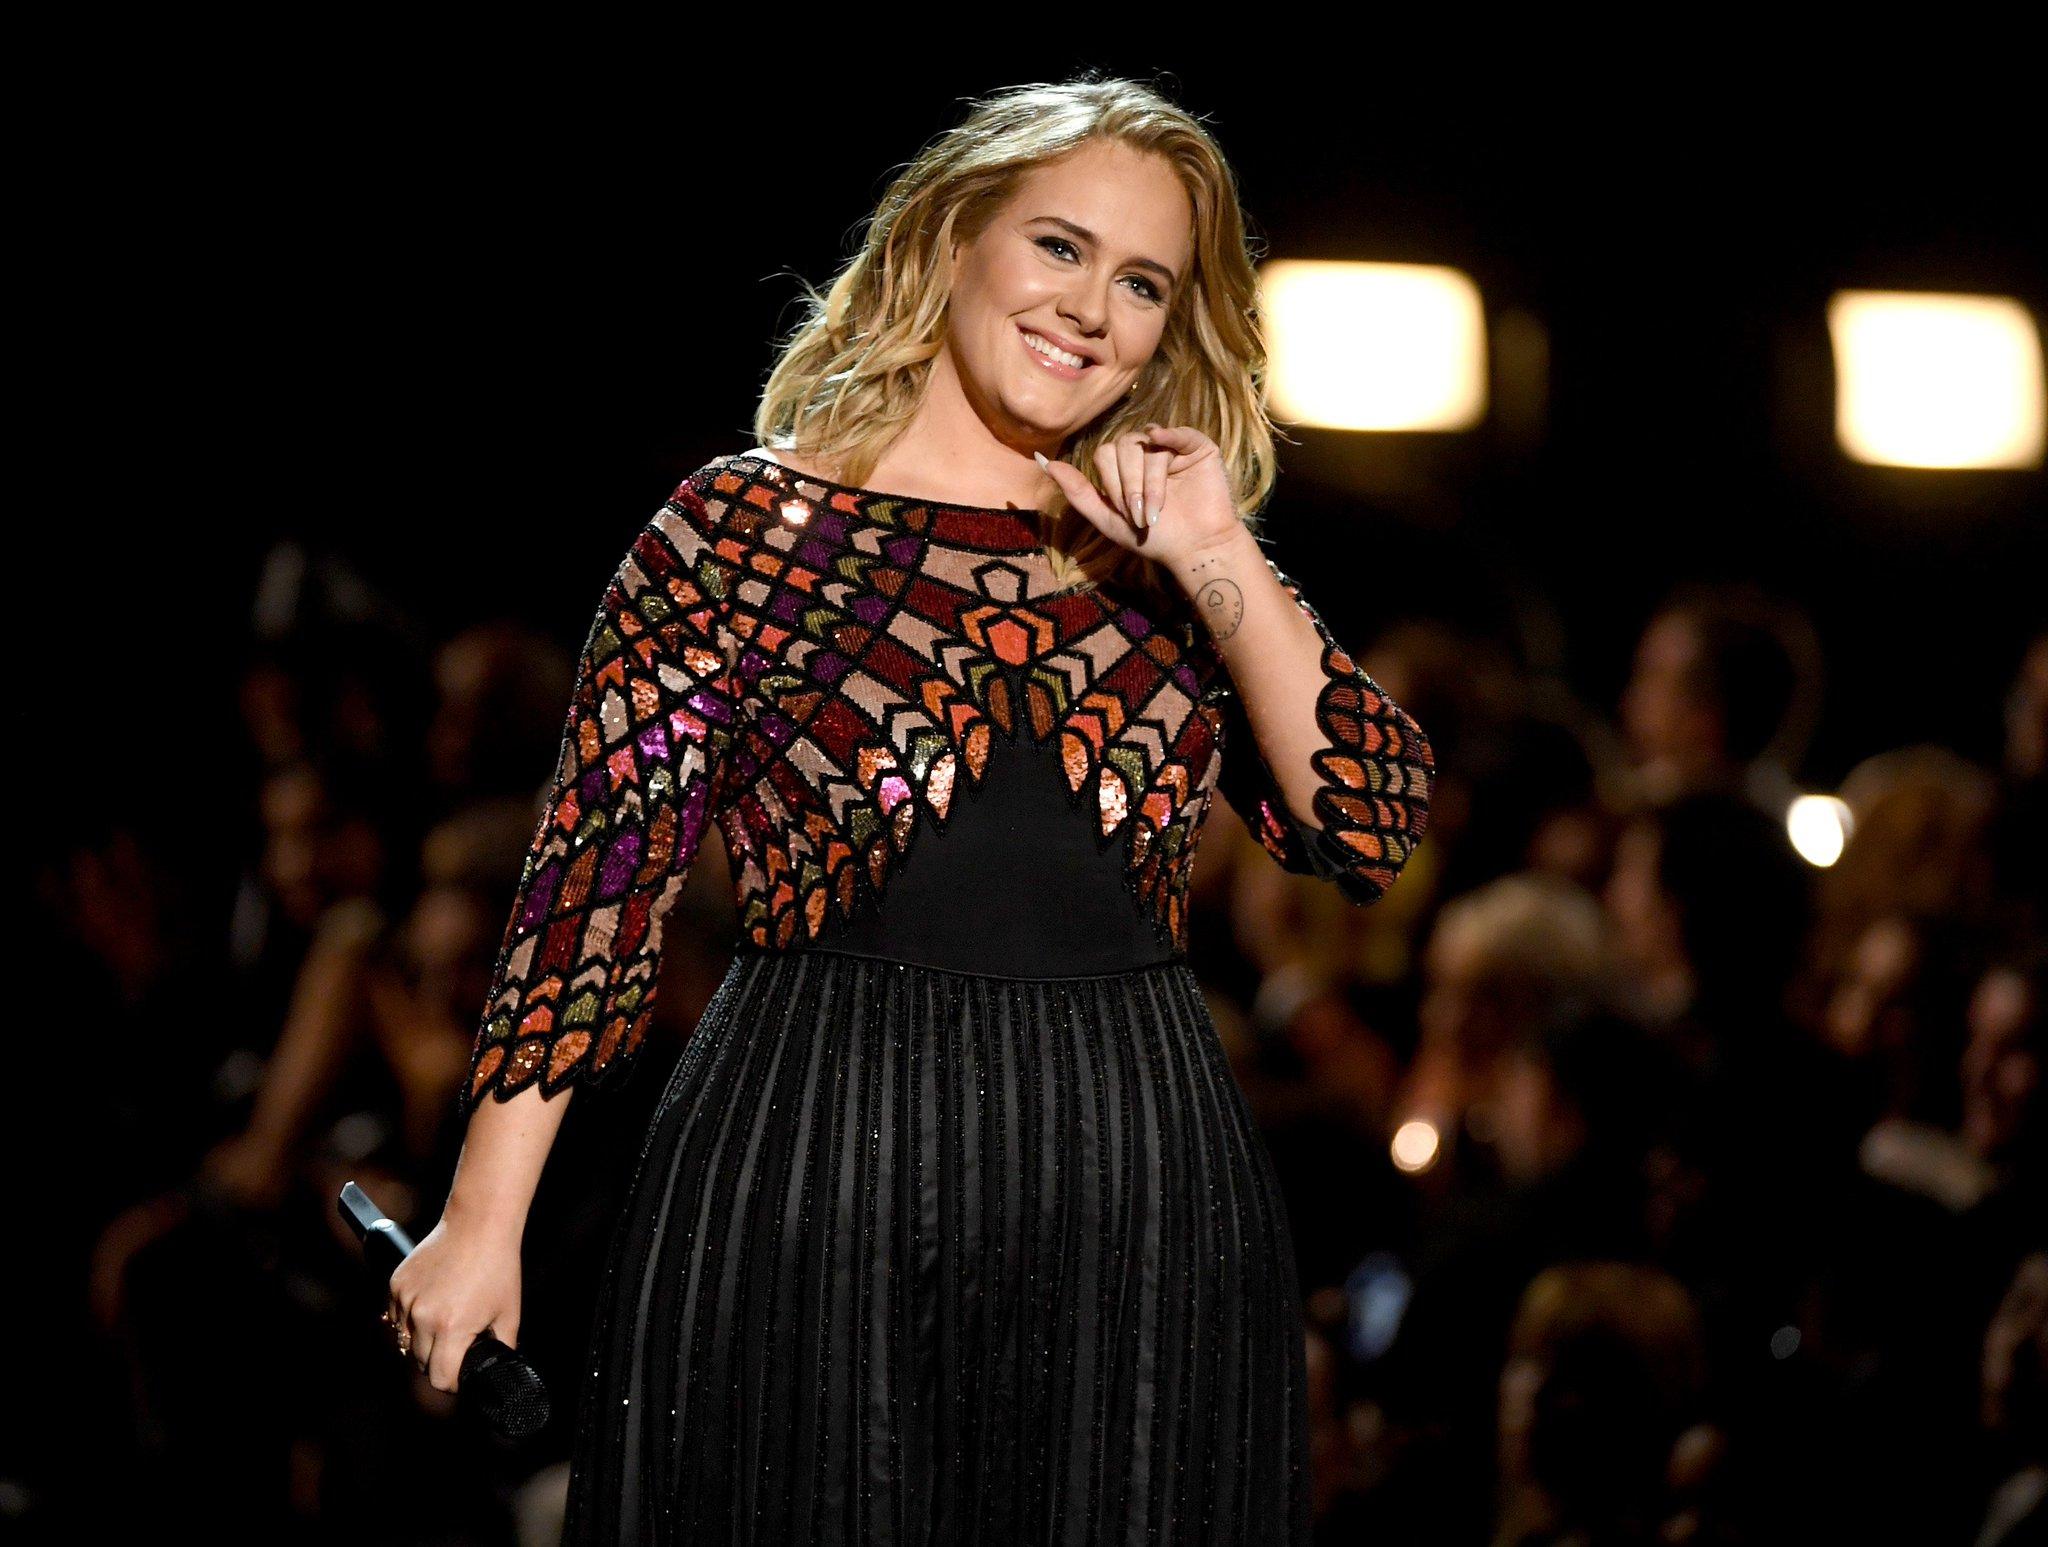 "Happy birthday juga untuk Adele. Penyanyi berusia 29 th ini pintar membuat lagu\"" galau menyayat hati"